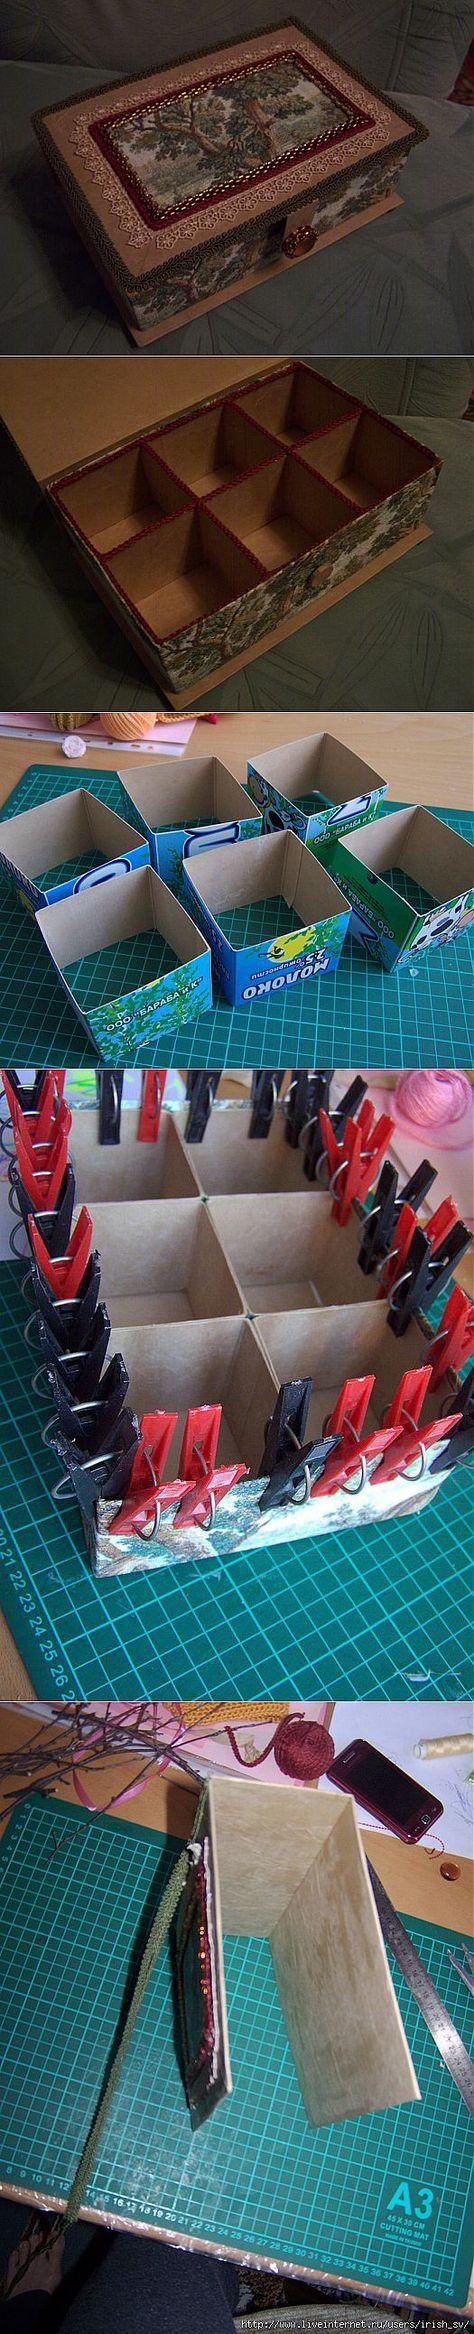 Шкатулка своими руками из коробочек